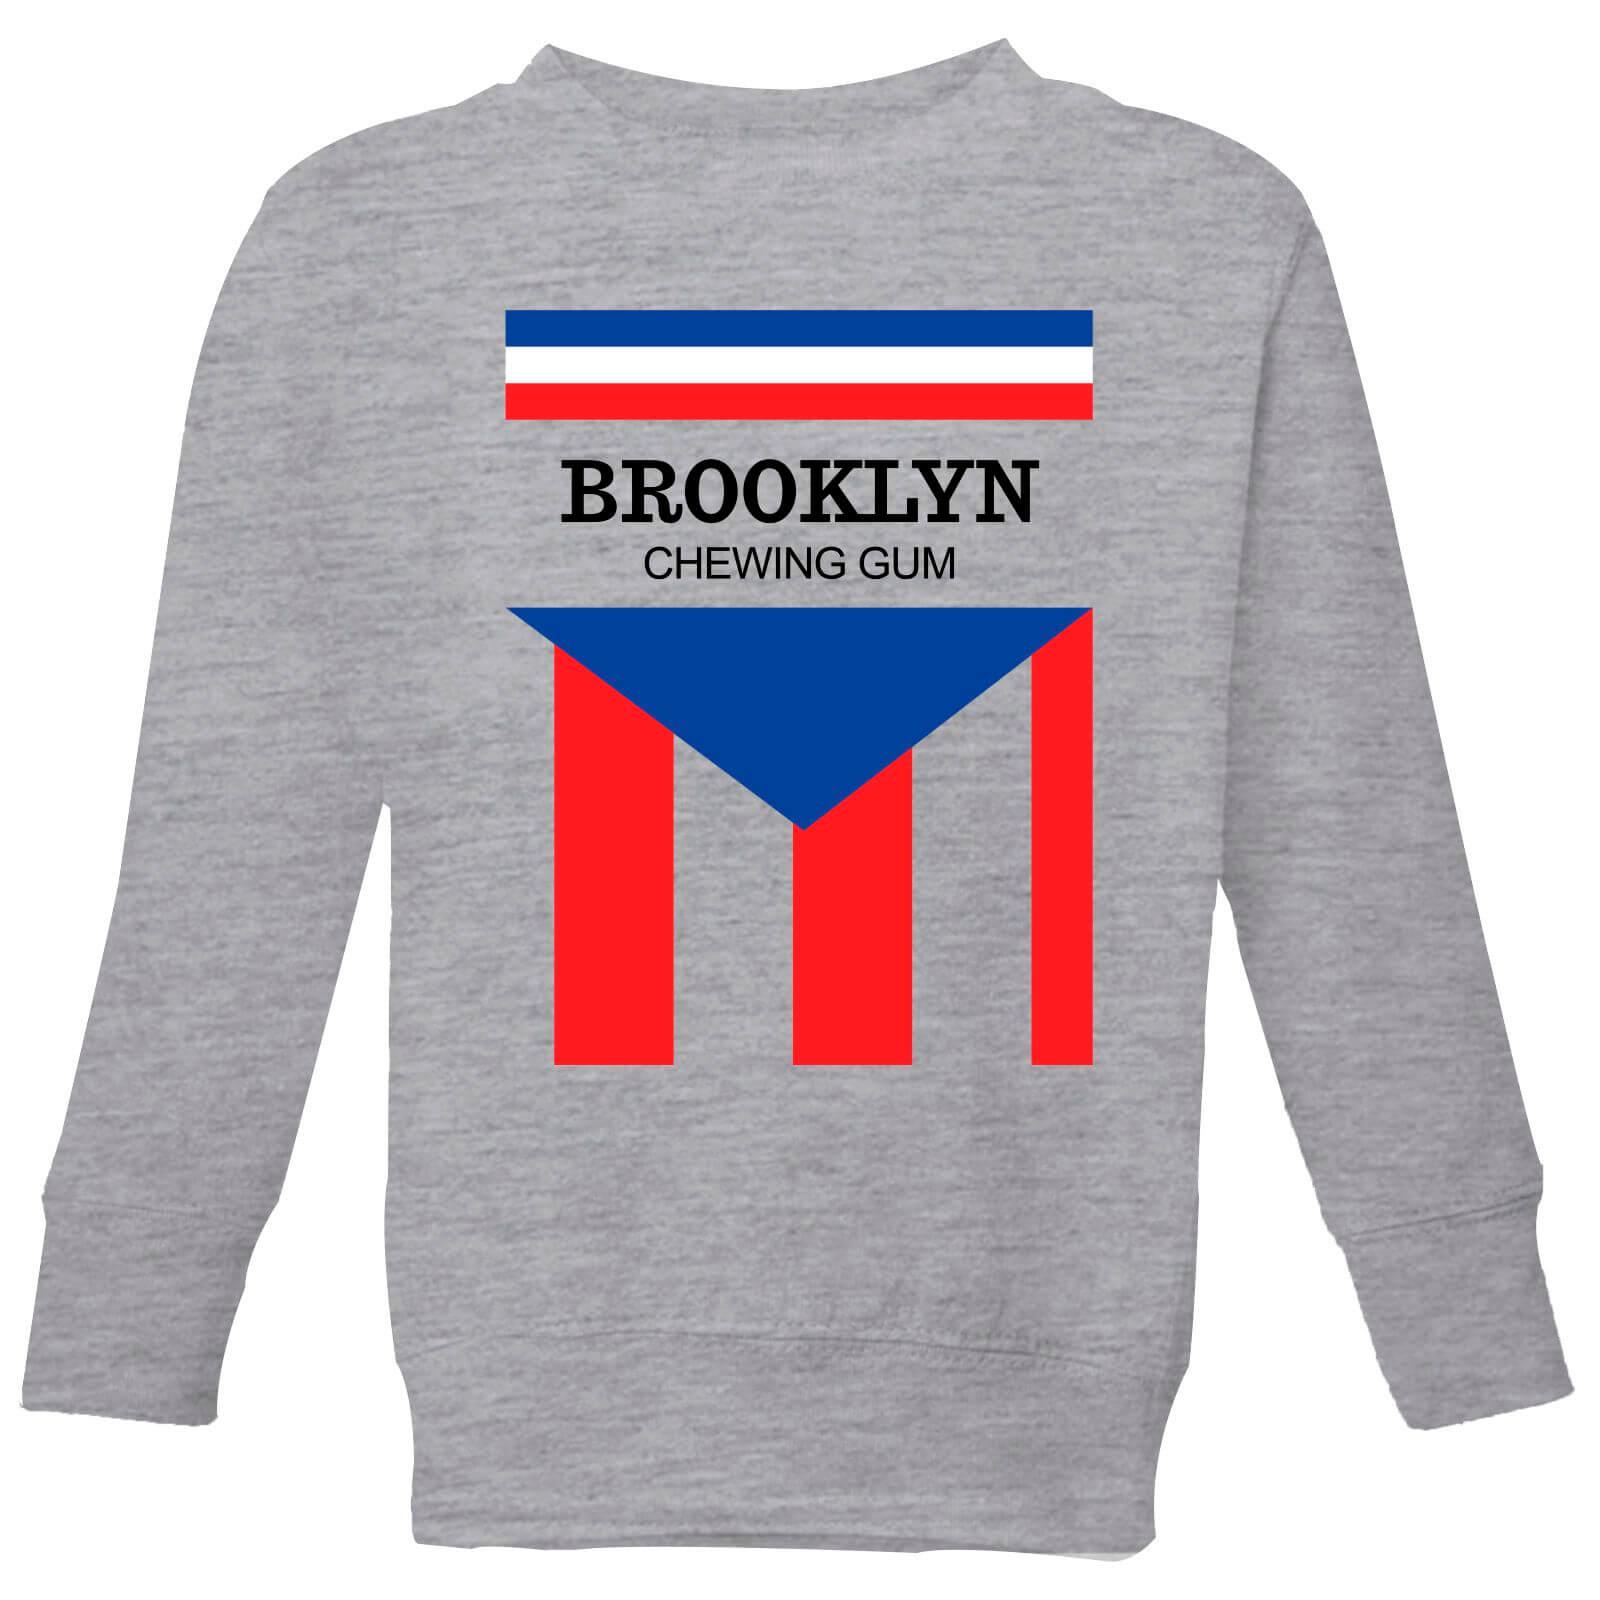 Summit Finish Brooklyn Chewing Gum Kids' Sweatshirt - Grey - 11-12 Years - Grey